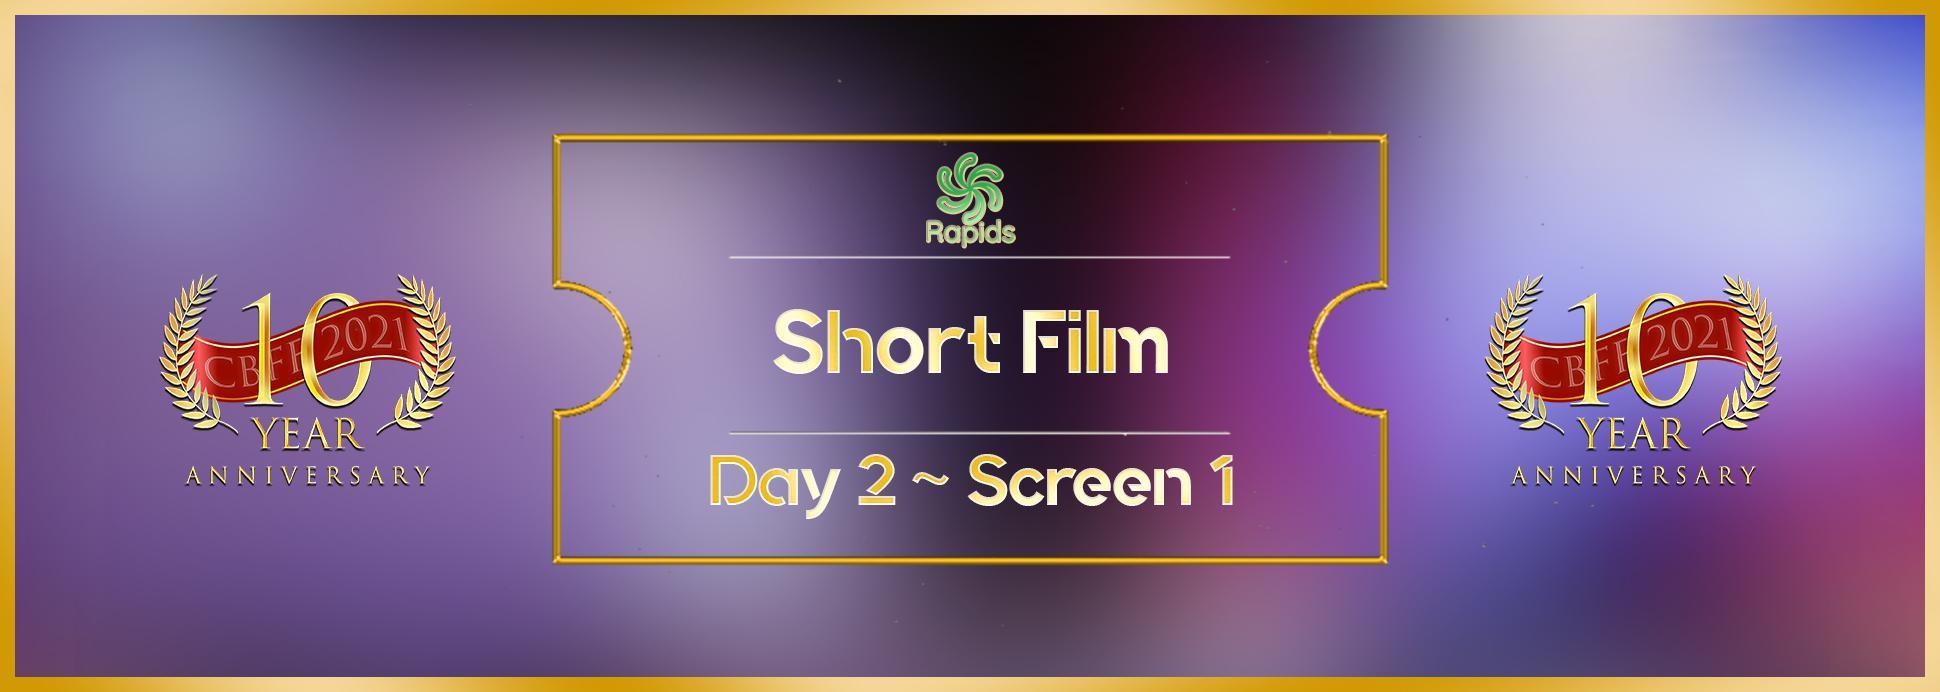 Day 2, Screen 1: Short Film